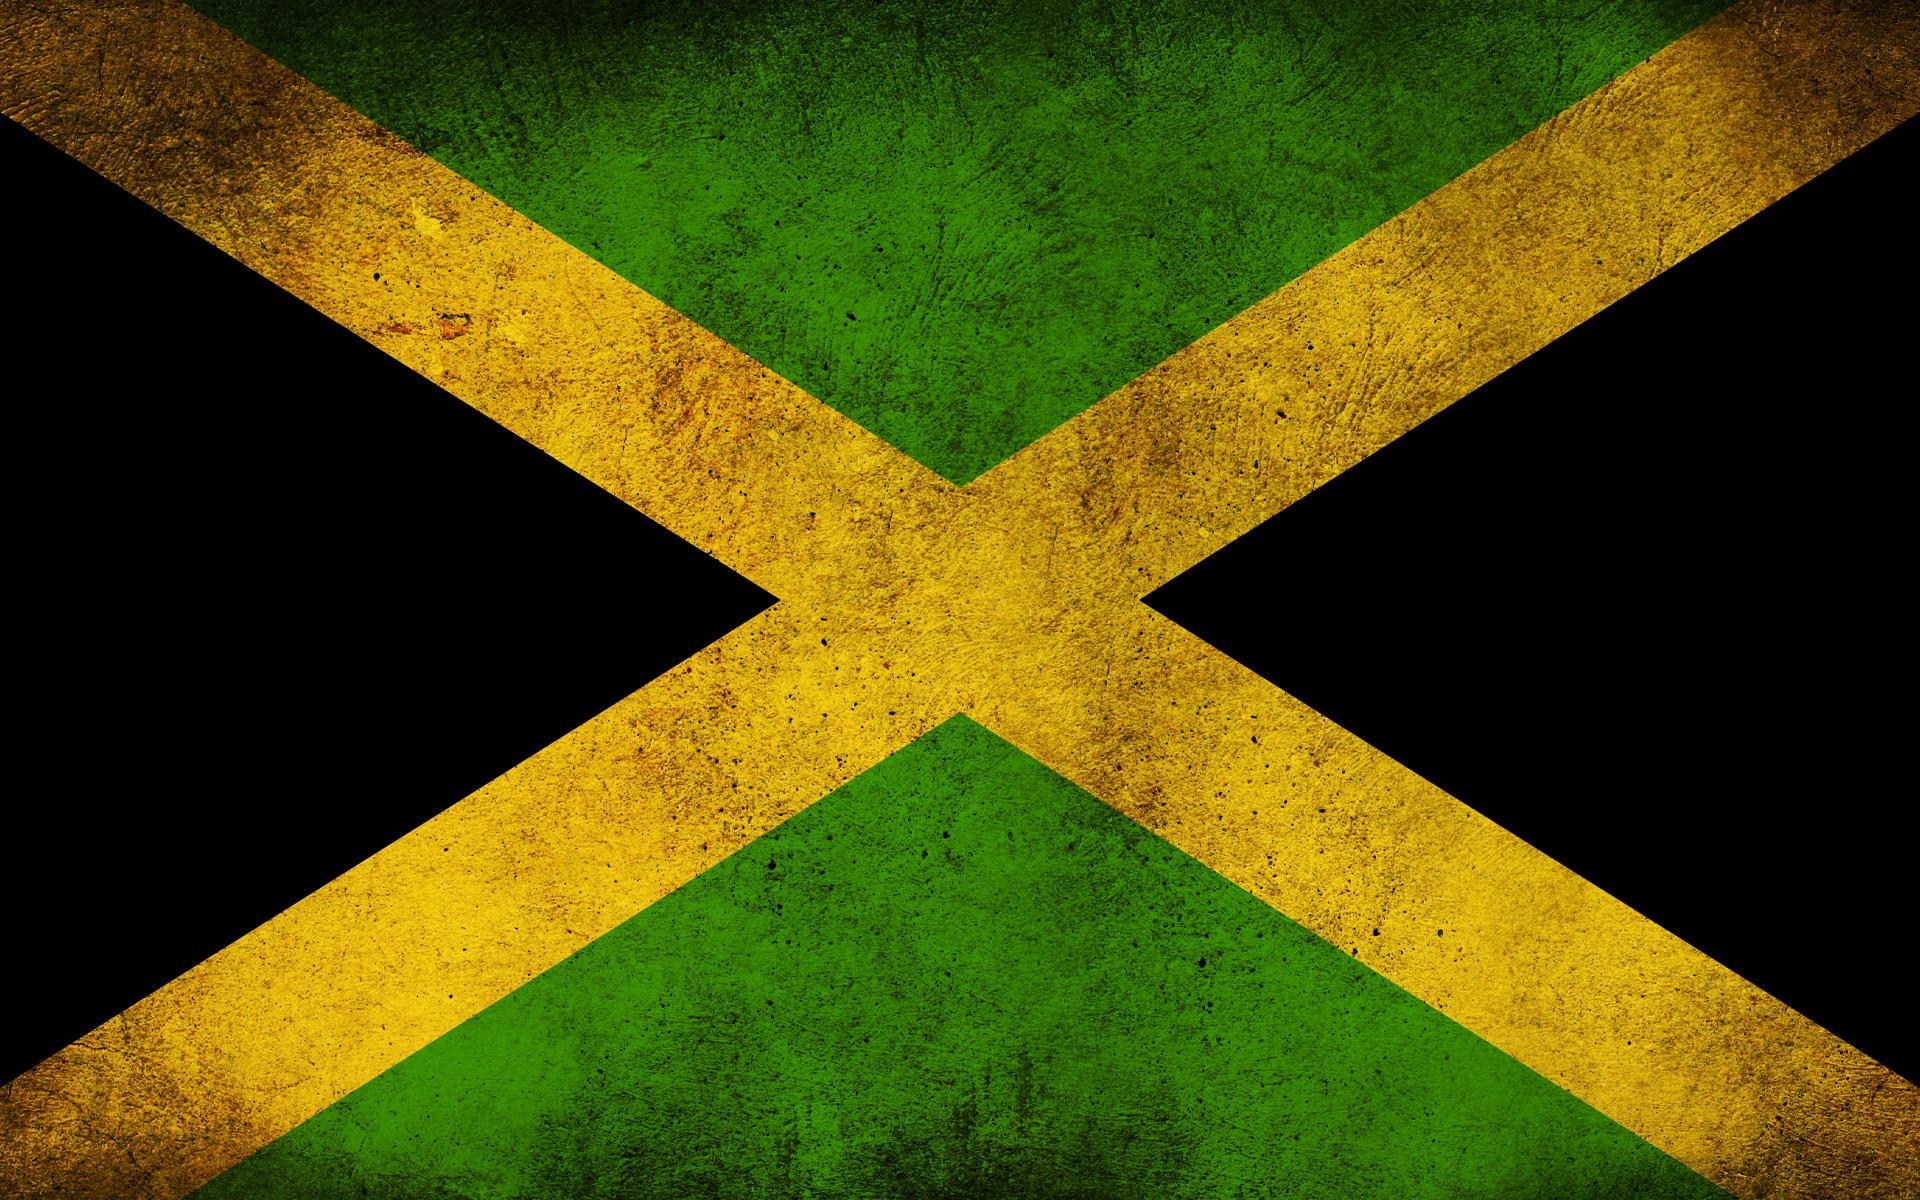 41] Jamaica Flags Wallpaper Background on WallpaperSafari 1920x1200